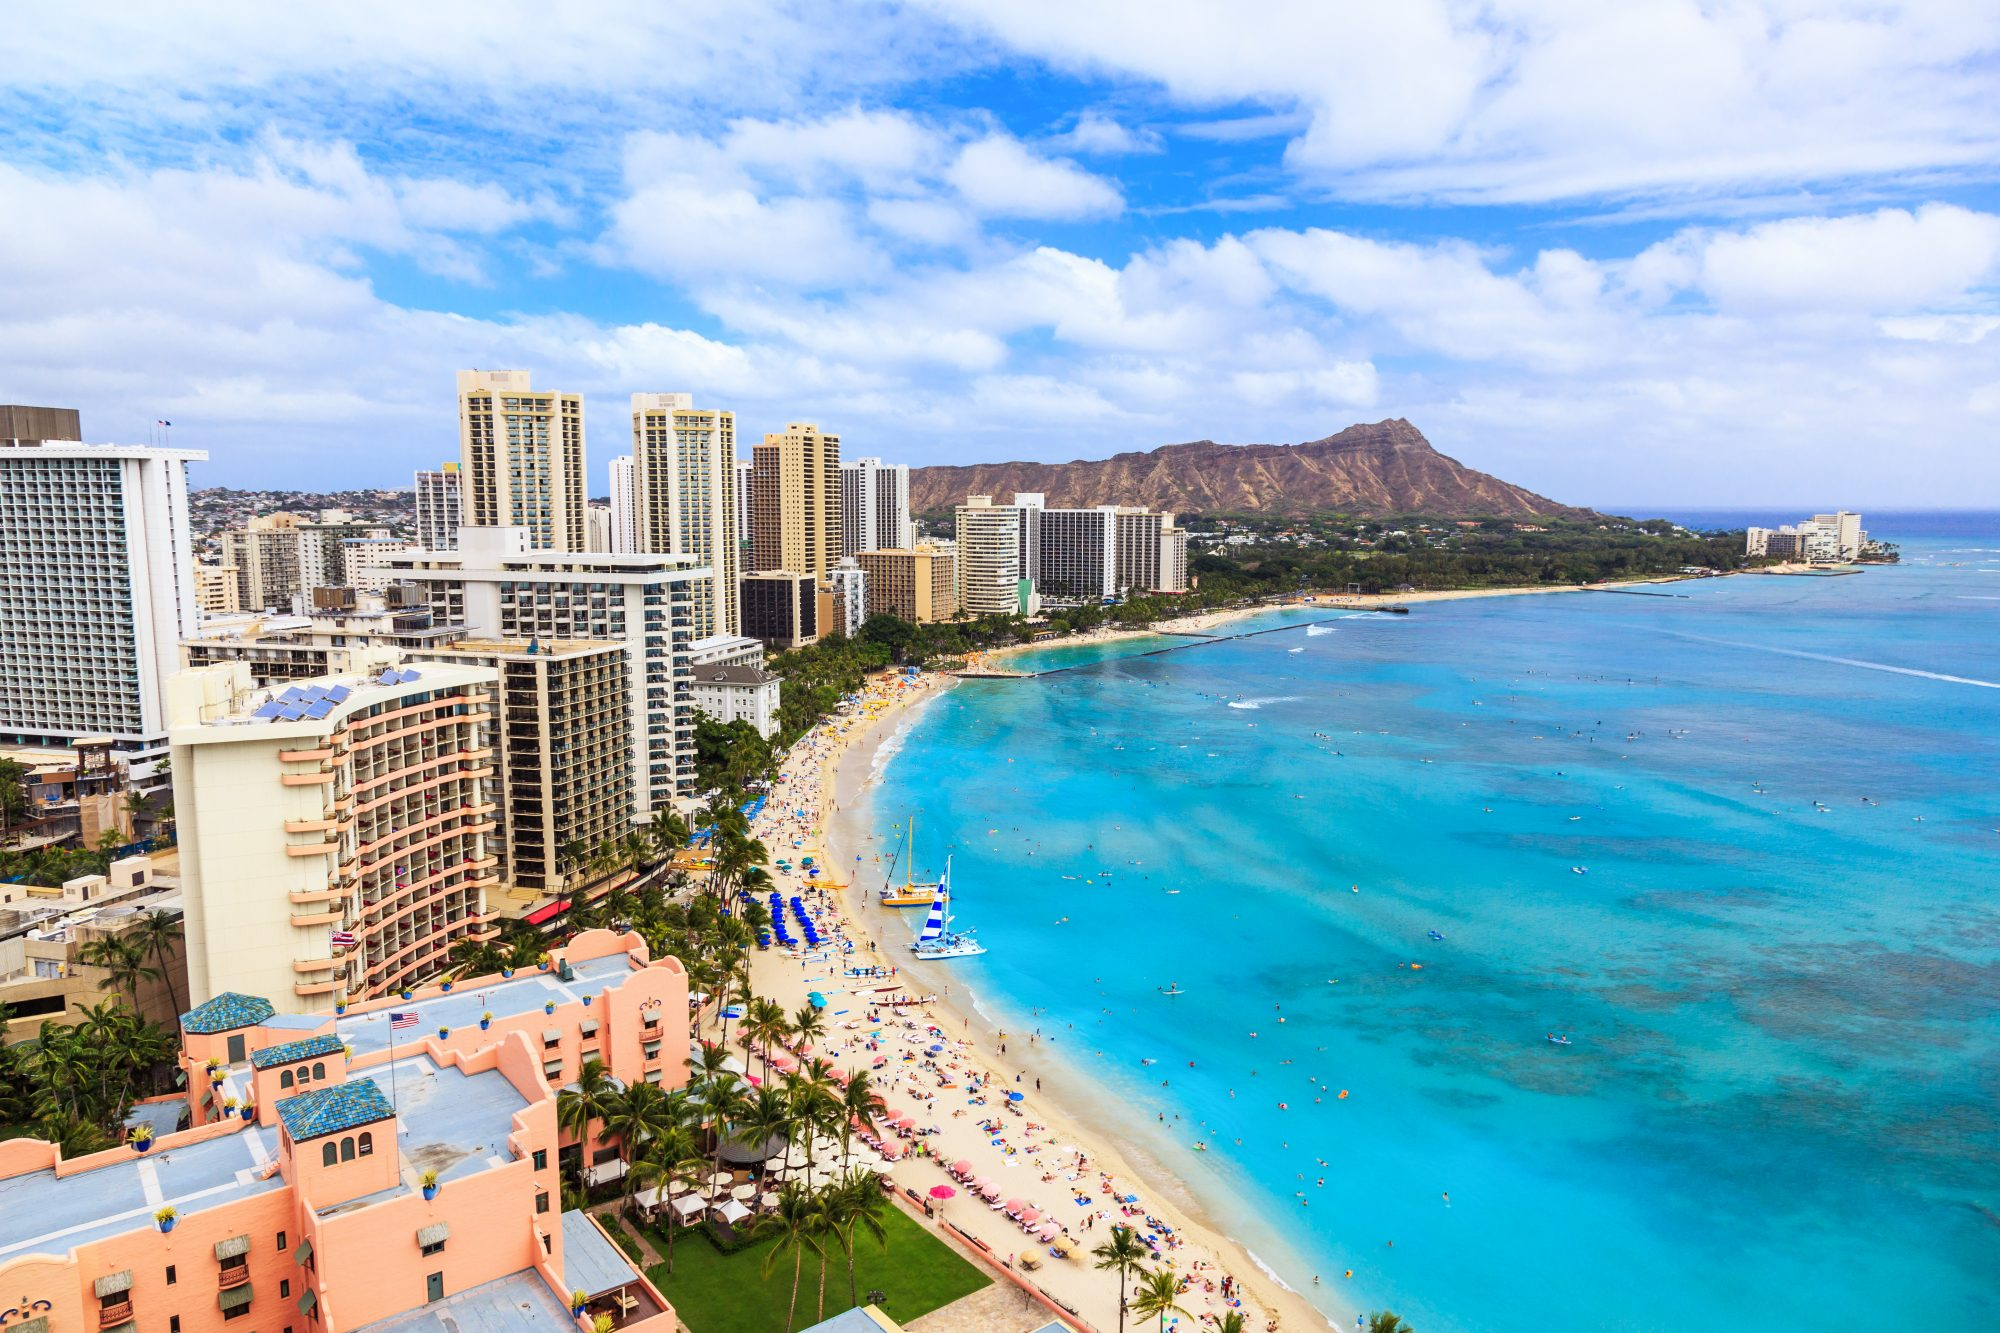 IMG_Event-City_Honolulu-HI_Shutterstock_557009353_L_081817